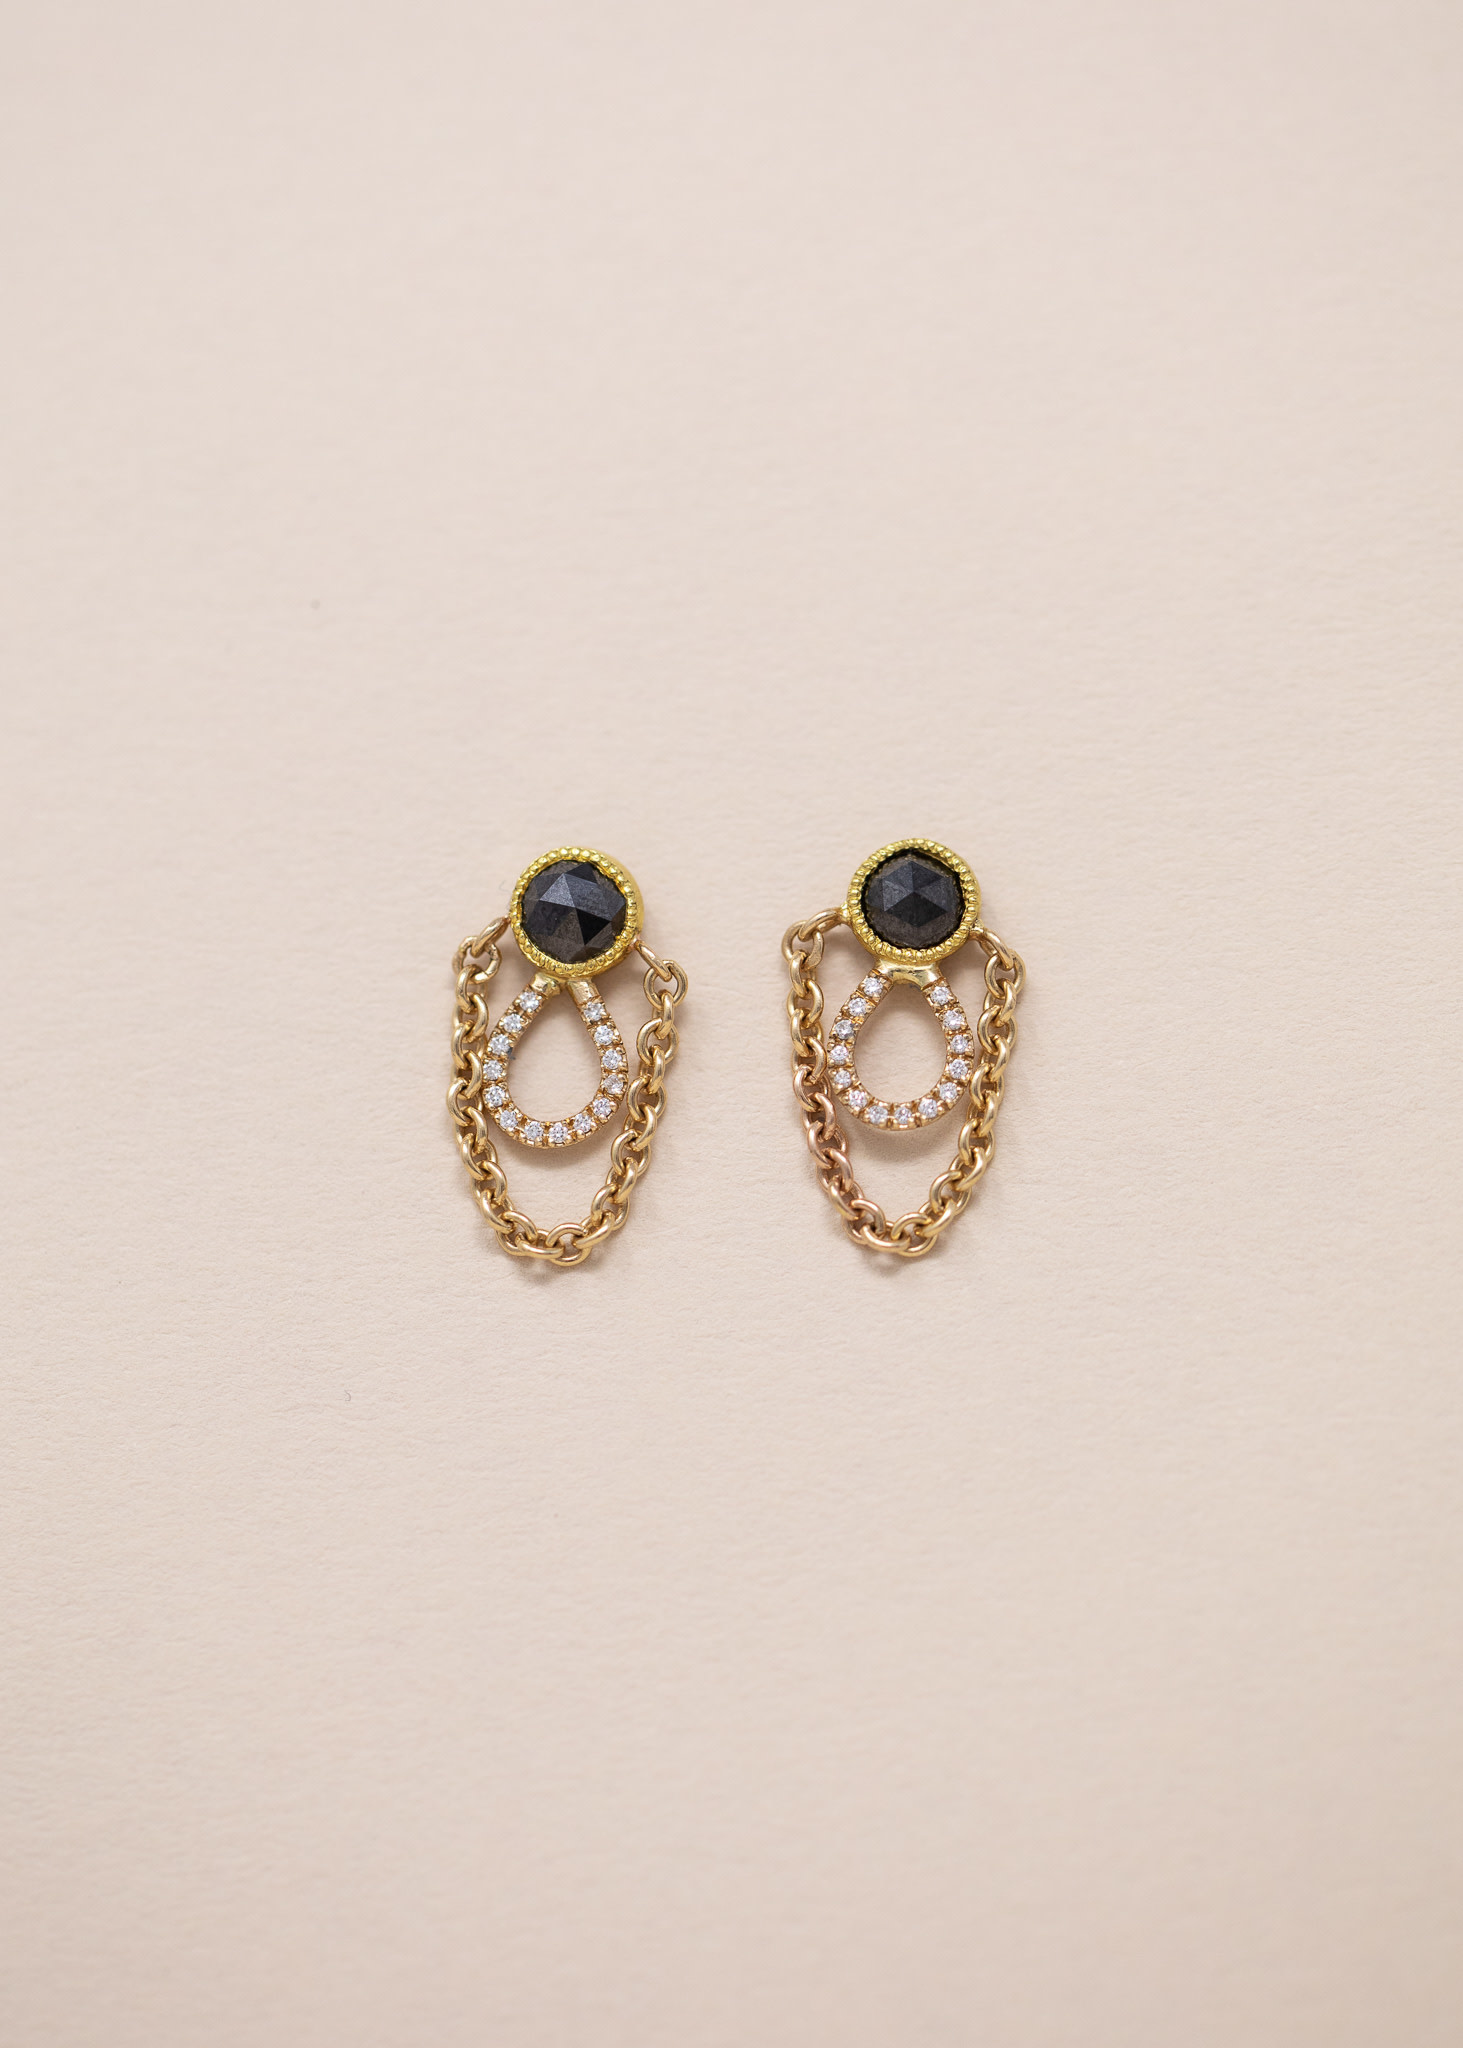 Asrai Garden Elizabeth Street Black Diamond Earrings Asrai Garden